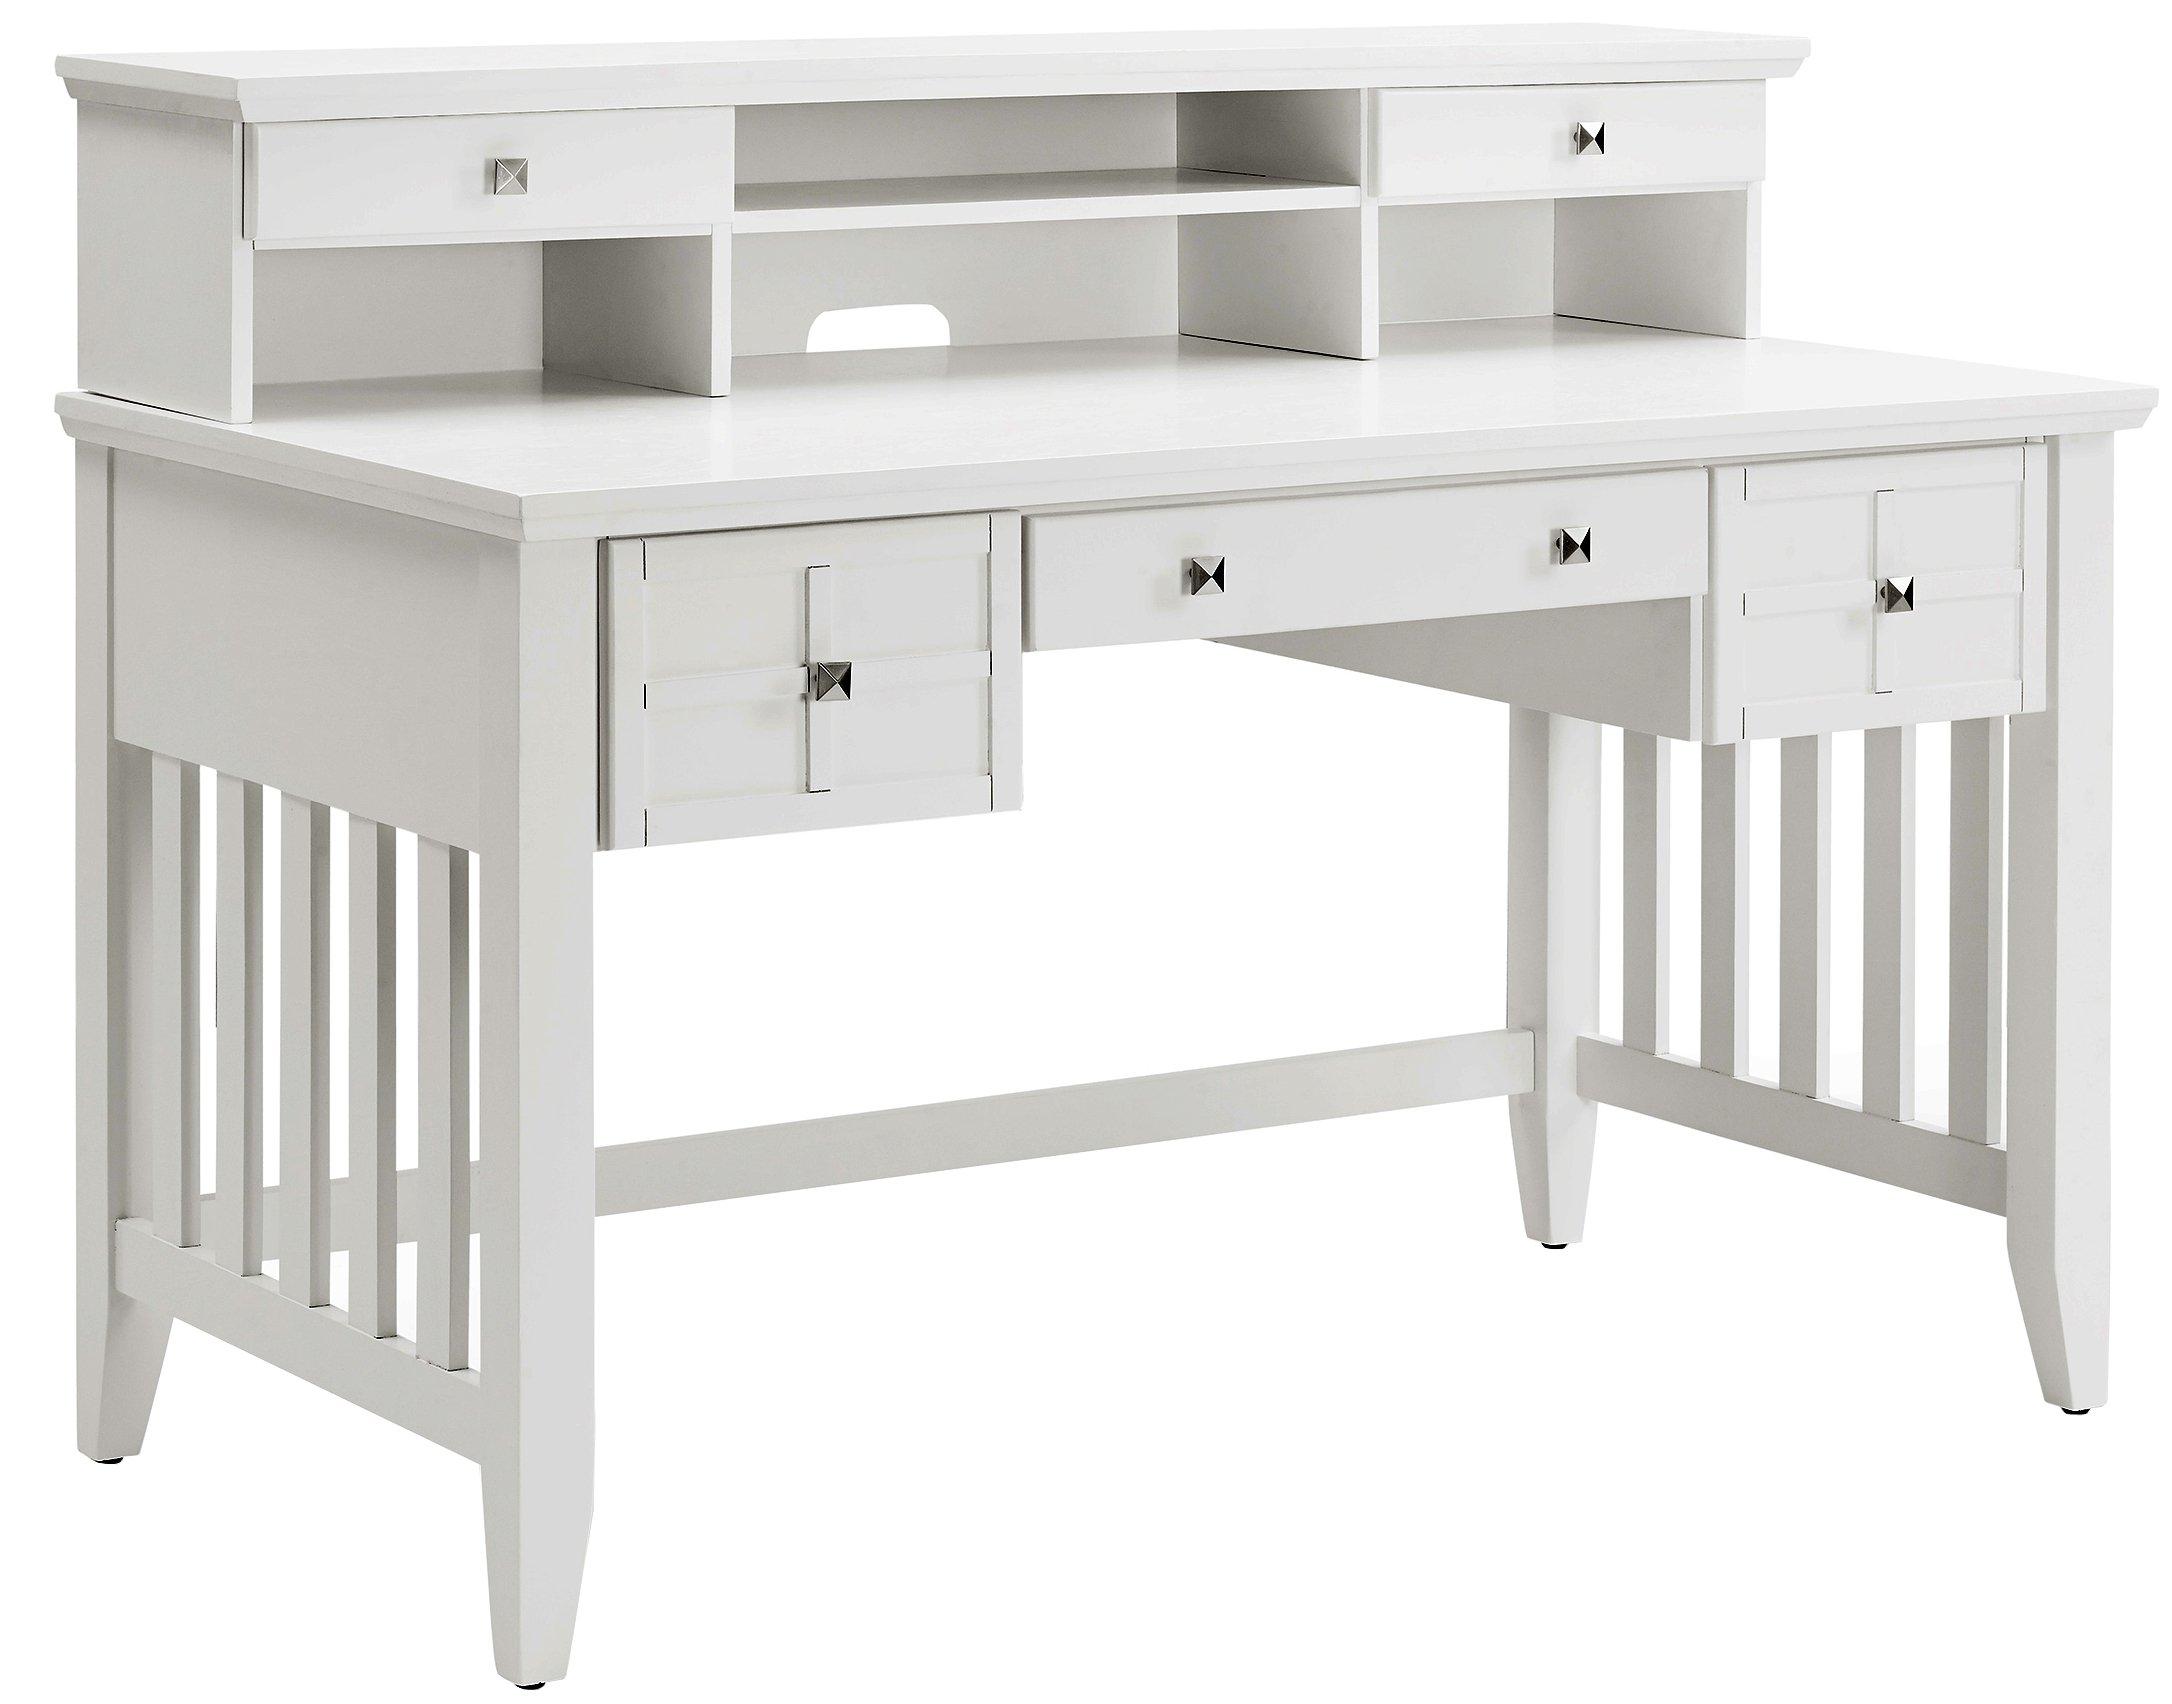 Crosley Furniture Adler Computer Desk with Hutch - White by Crosley Furniture